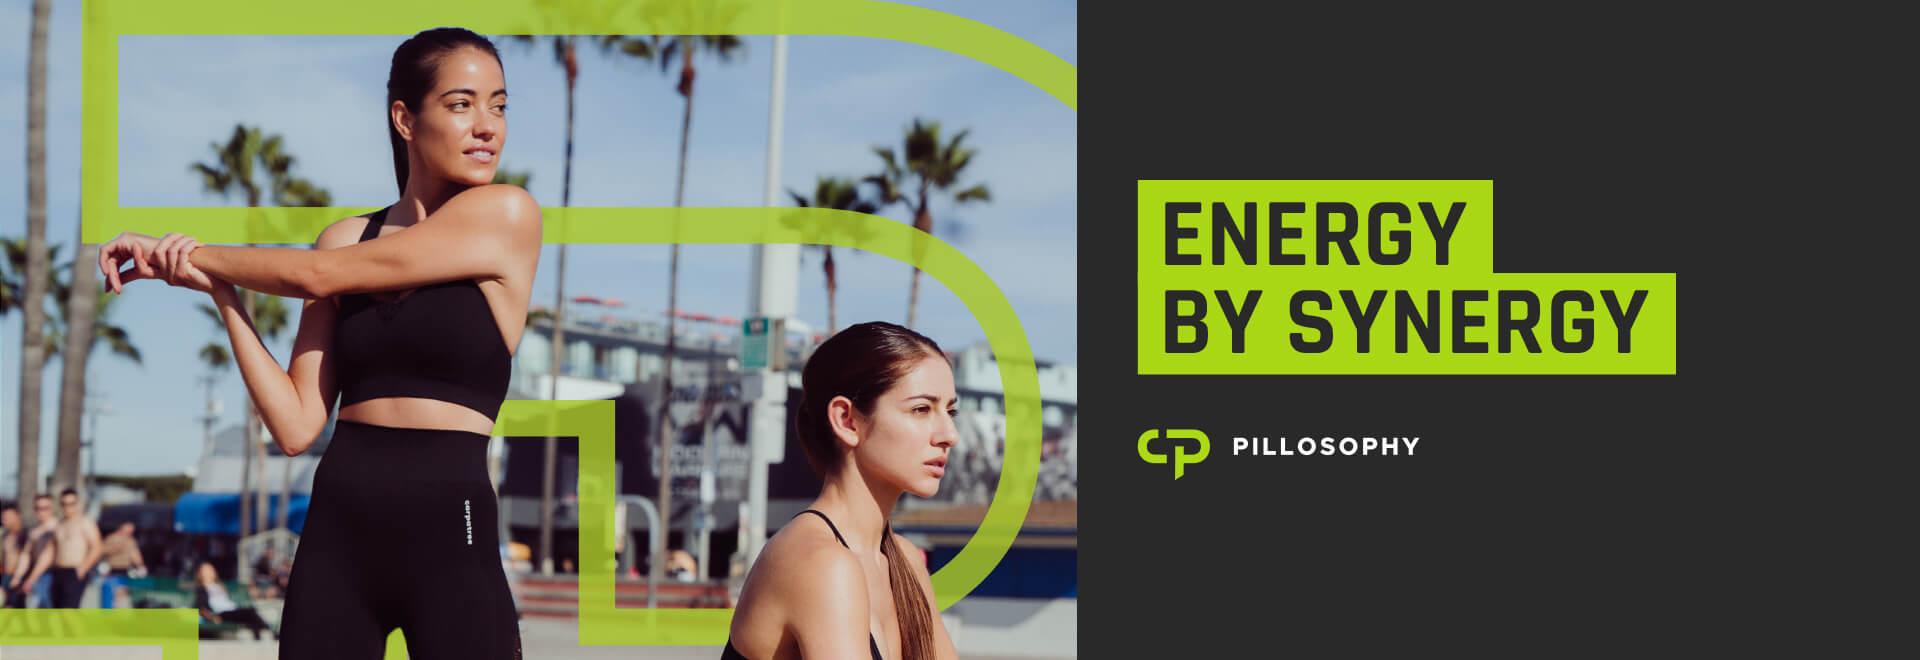 Energy by synergy